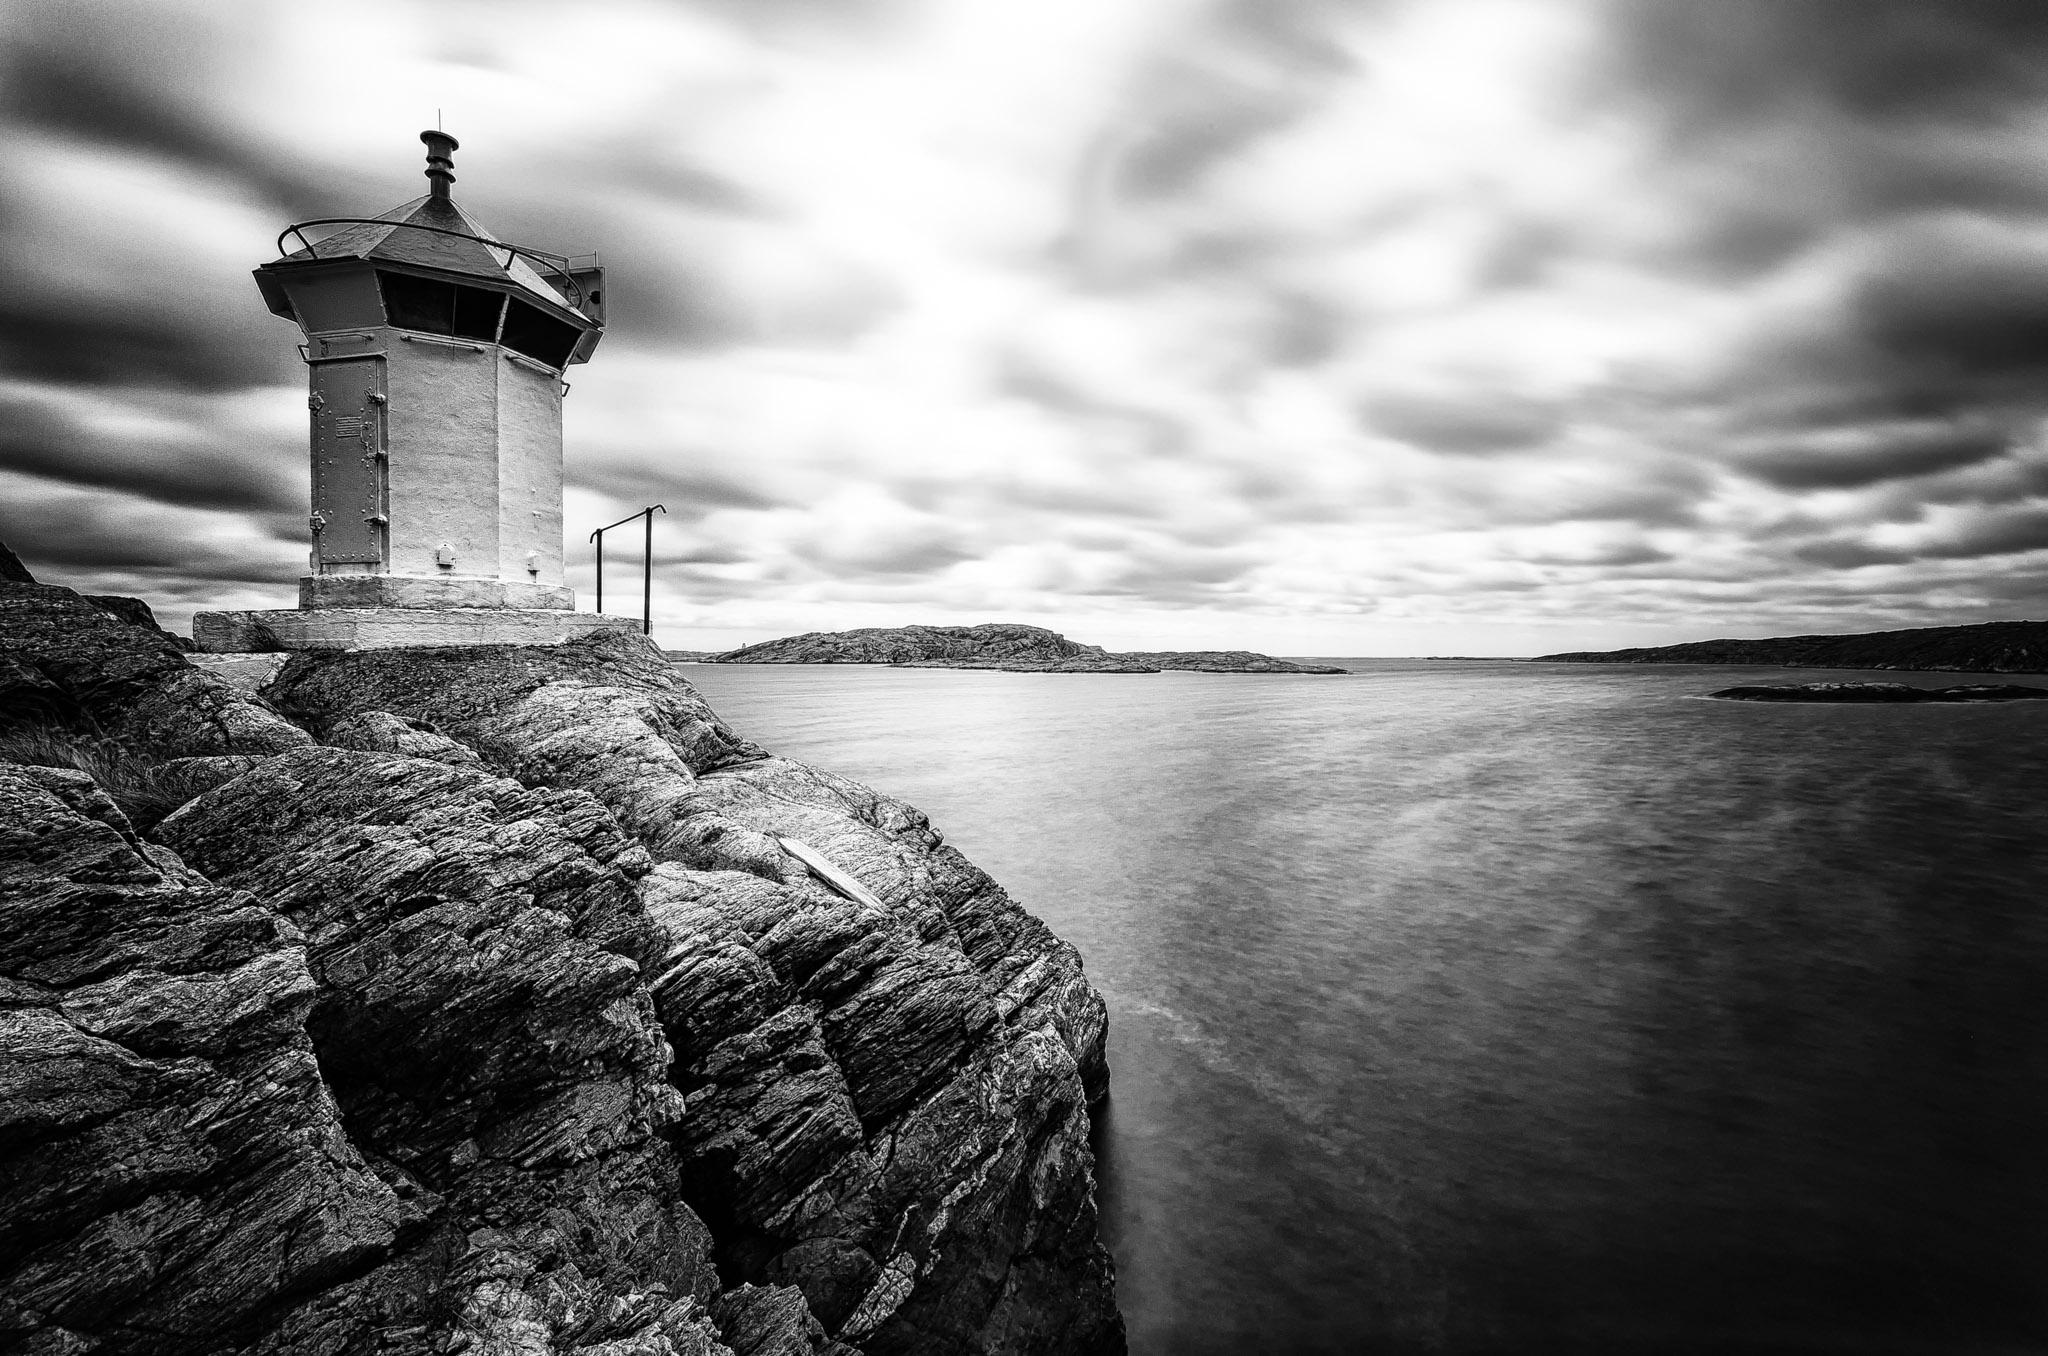 Lighthouse Skagerrak, Hälleviksstrand, Sweden